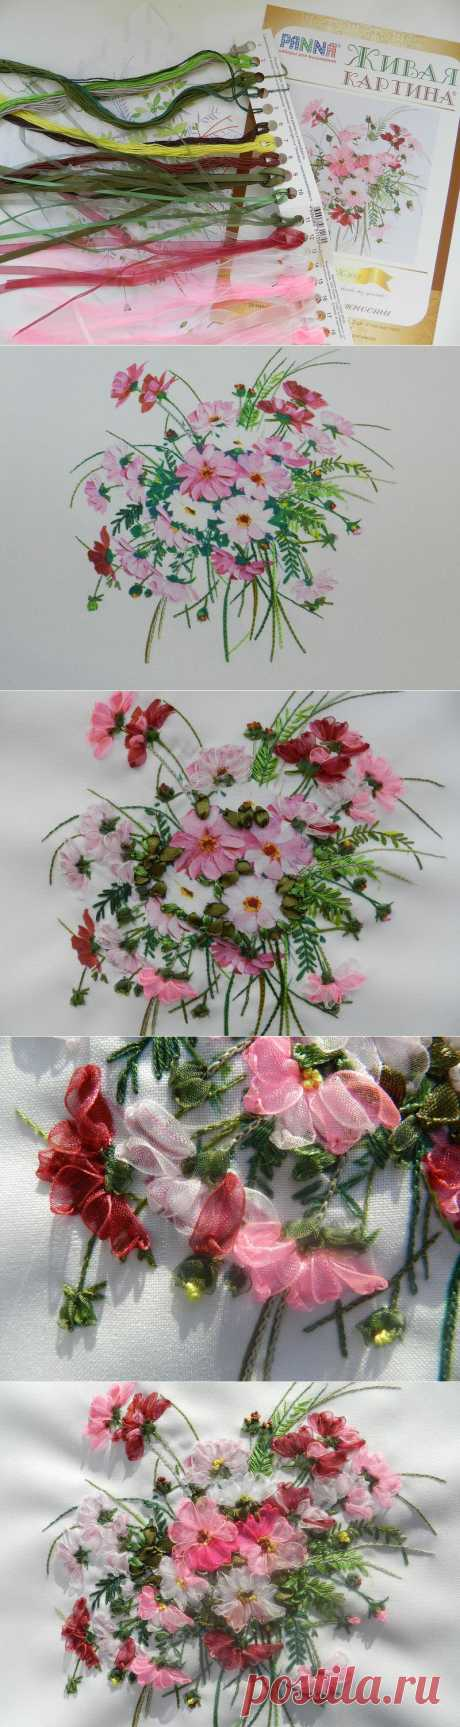 Tenderness breath \/ Flower mood \/ PassionForum - master classes in needlework